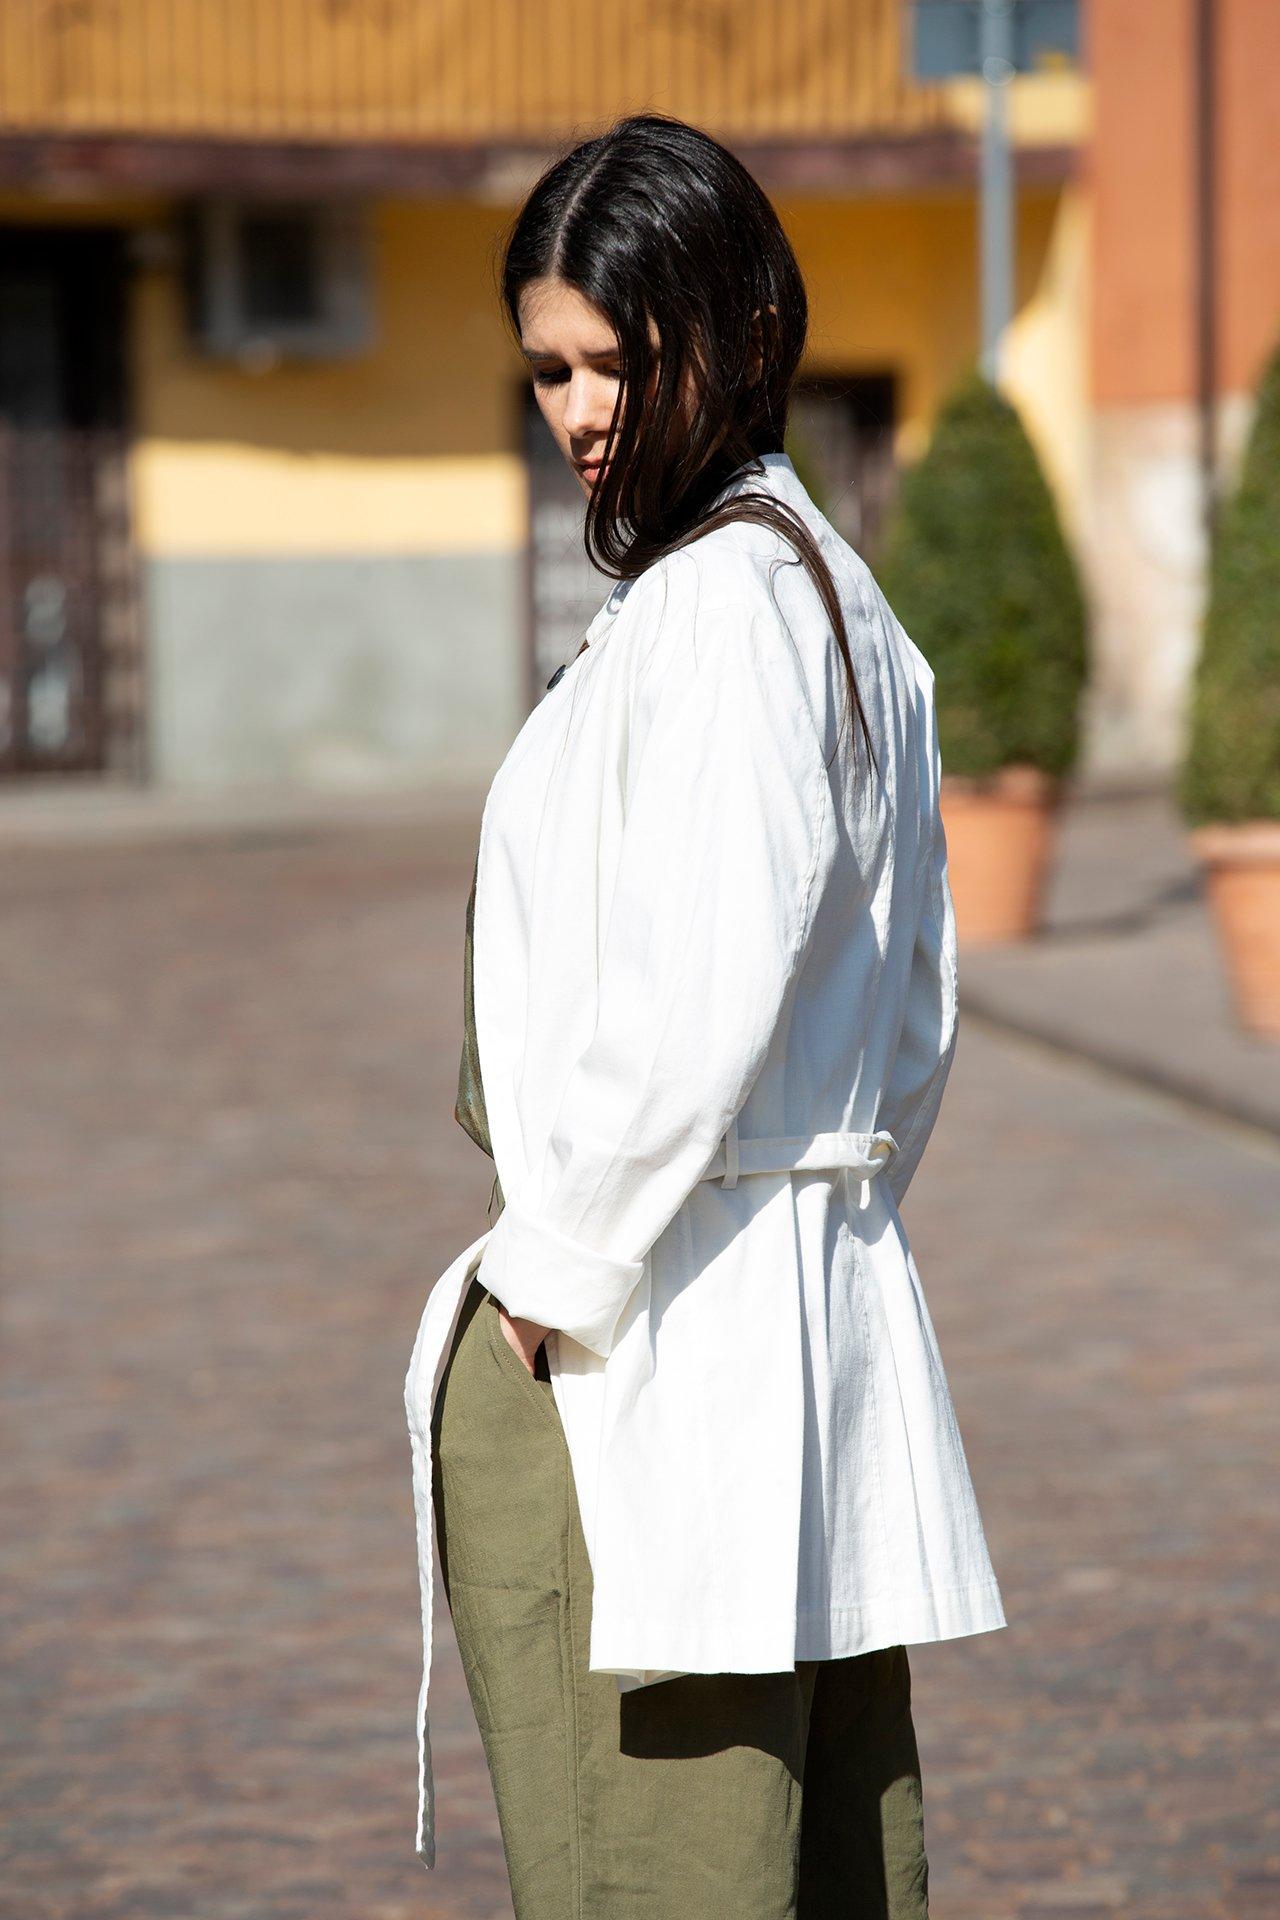 Image of Giacca Bianca